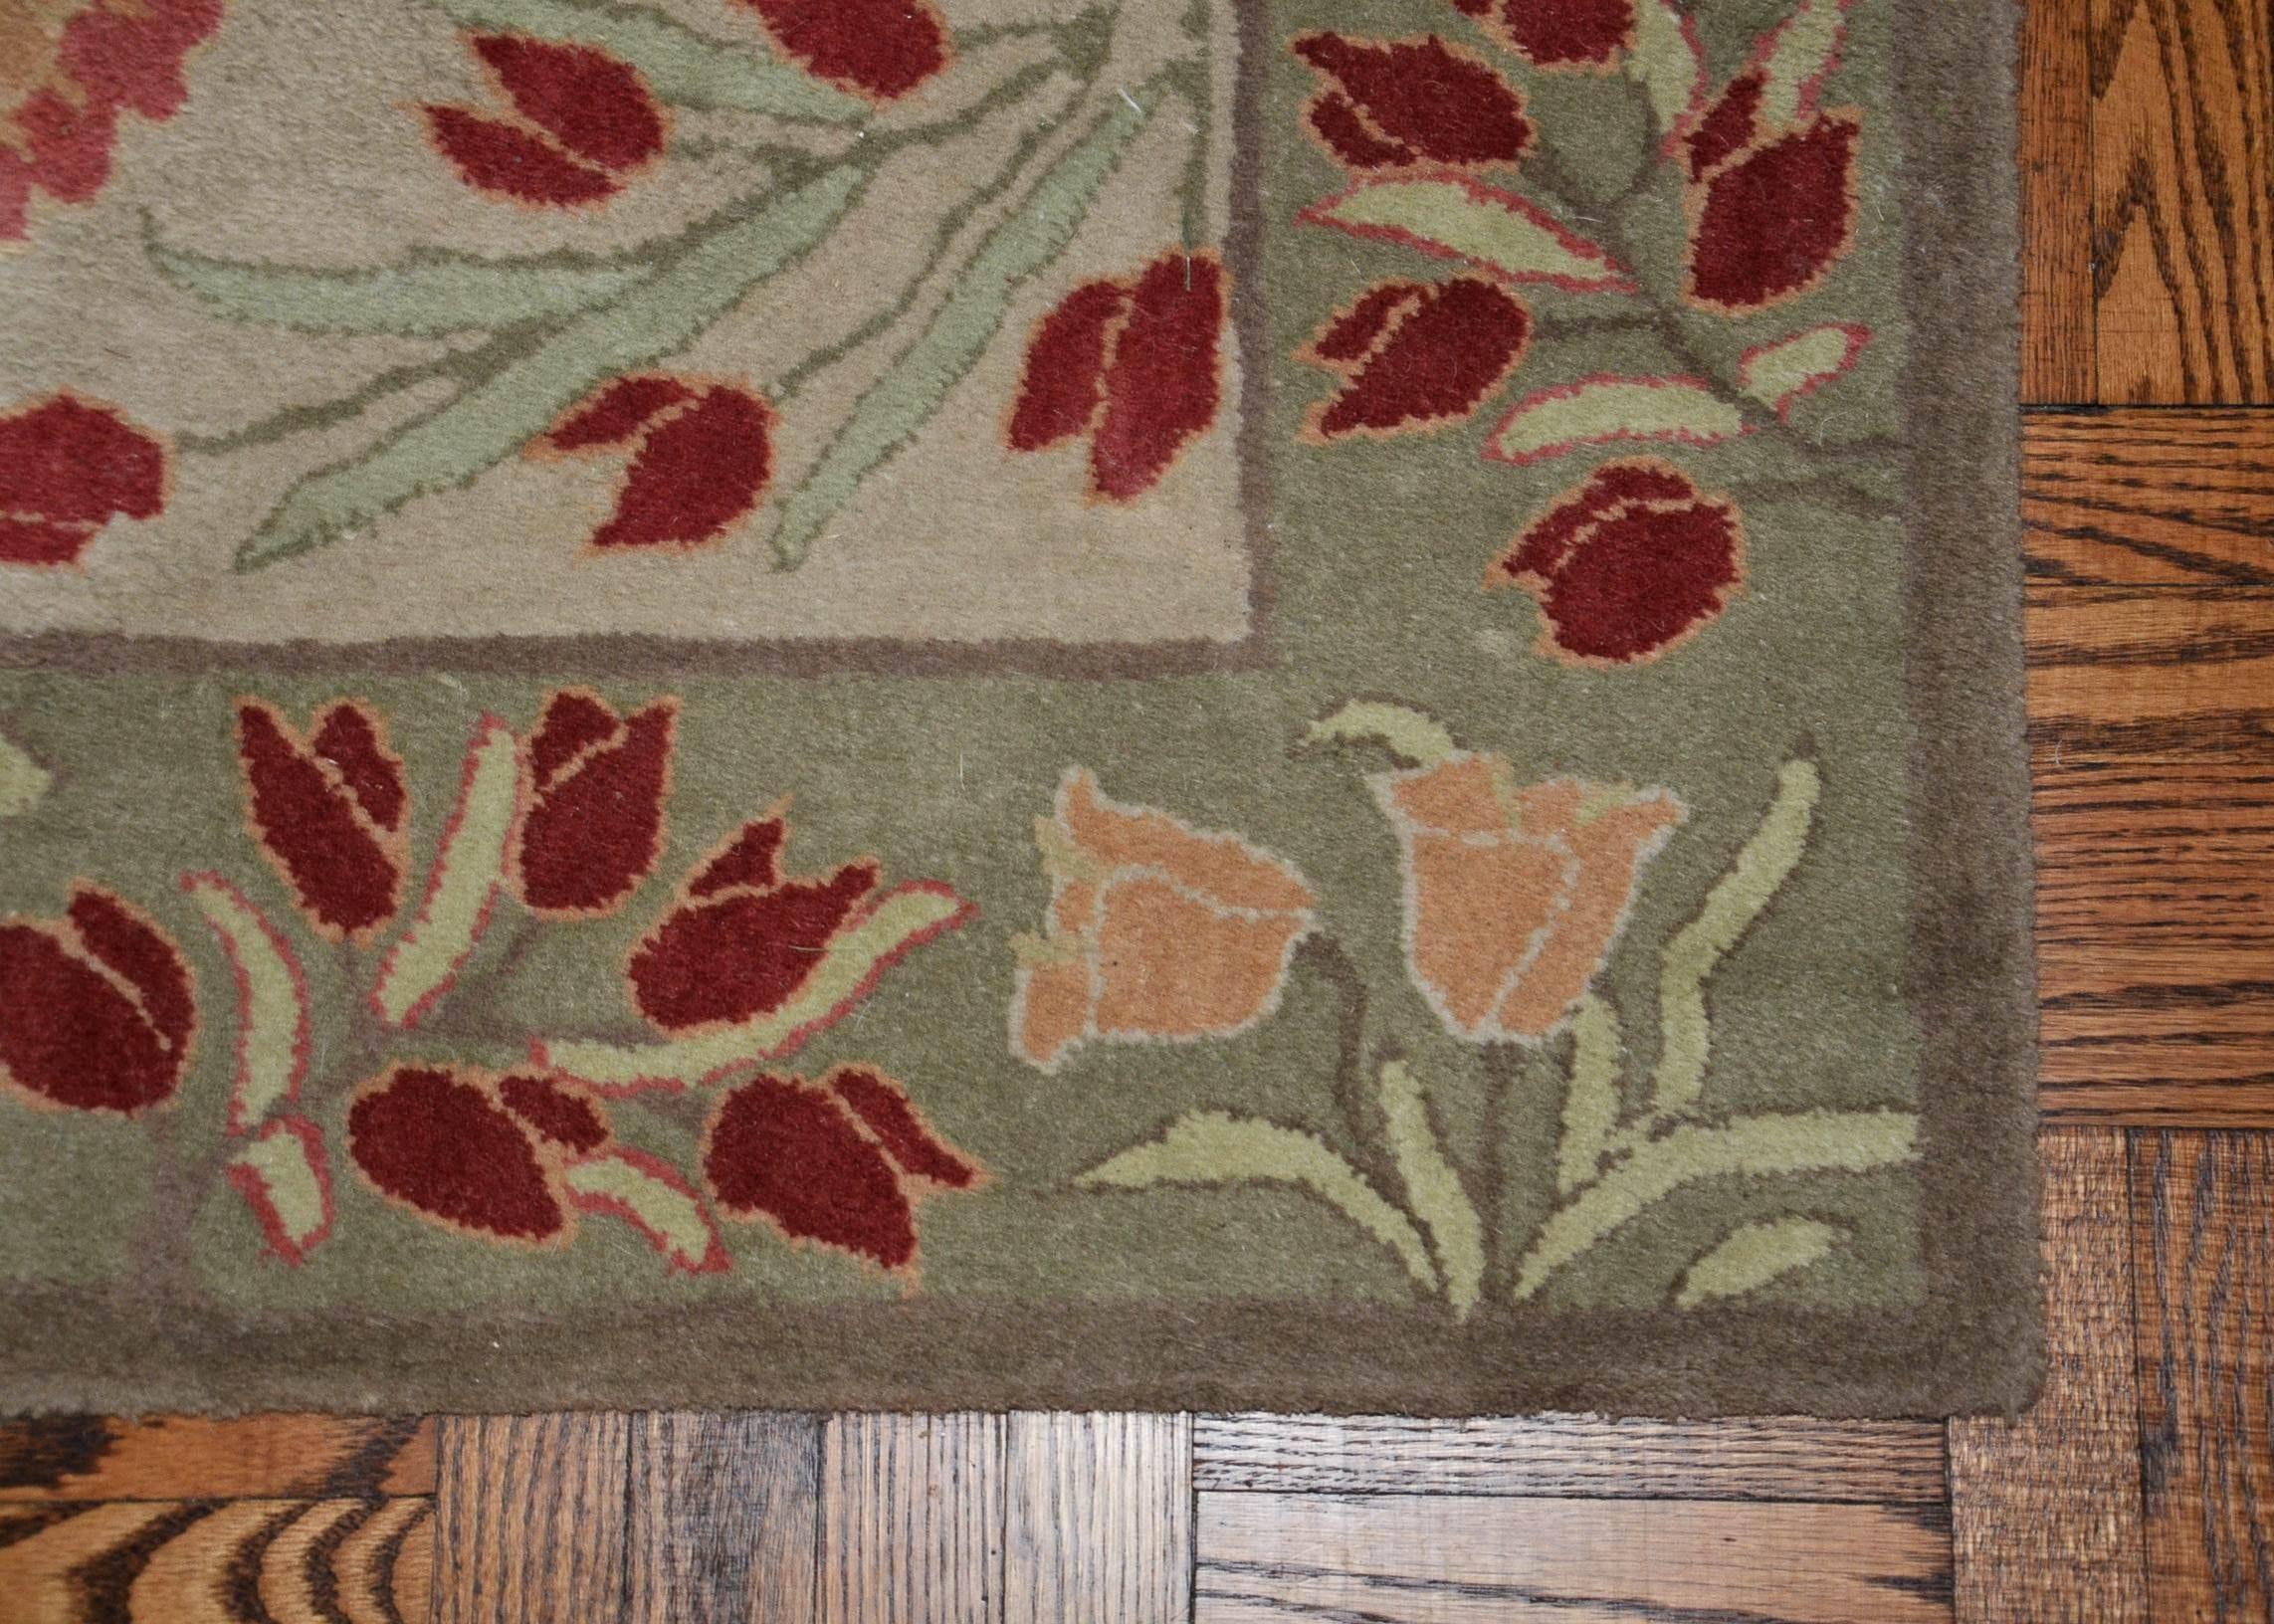 pottery barn adeline wool area rug ebth